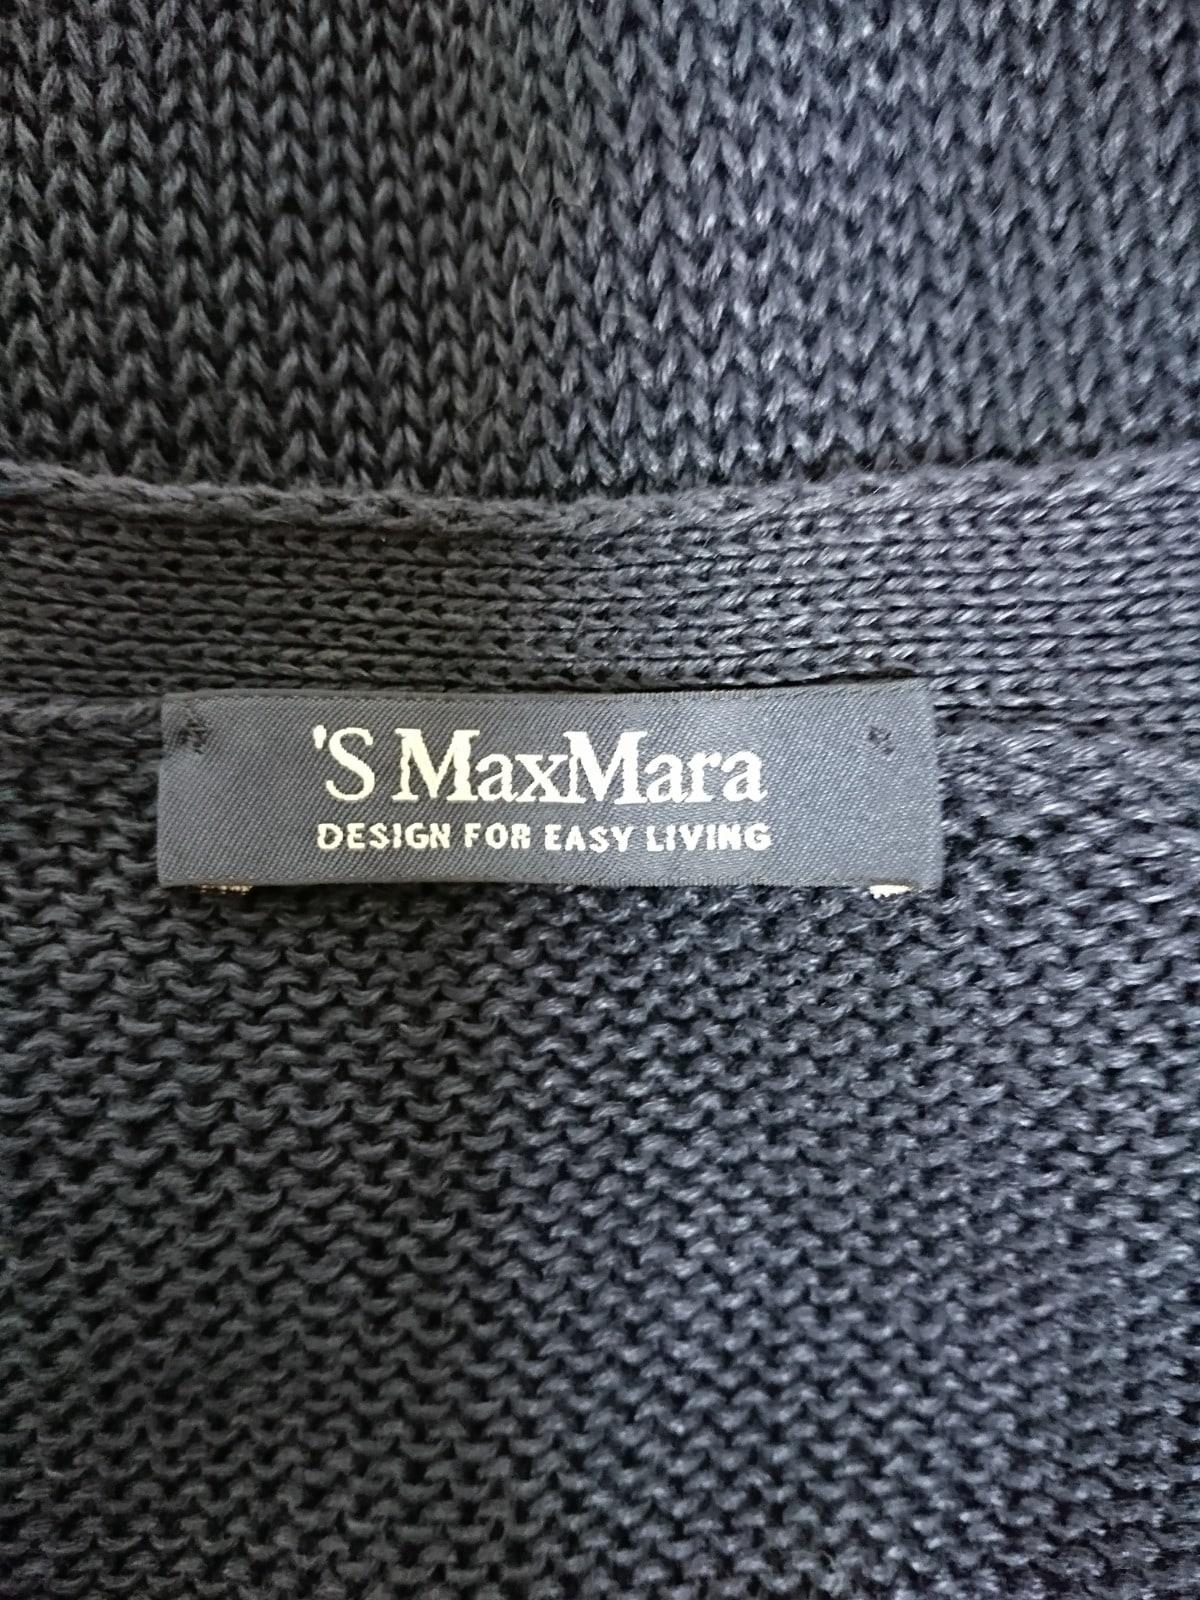 S Max Mara(マックスマーラ)のカーディガン